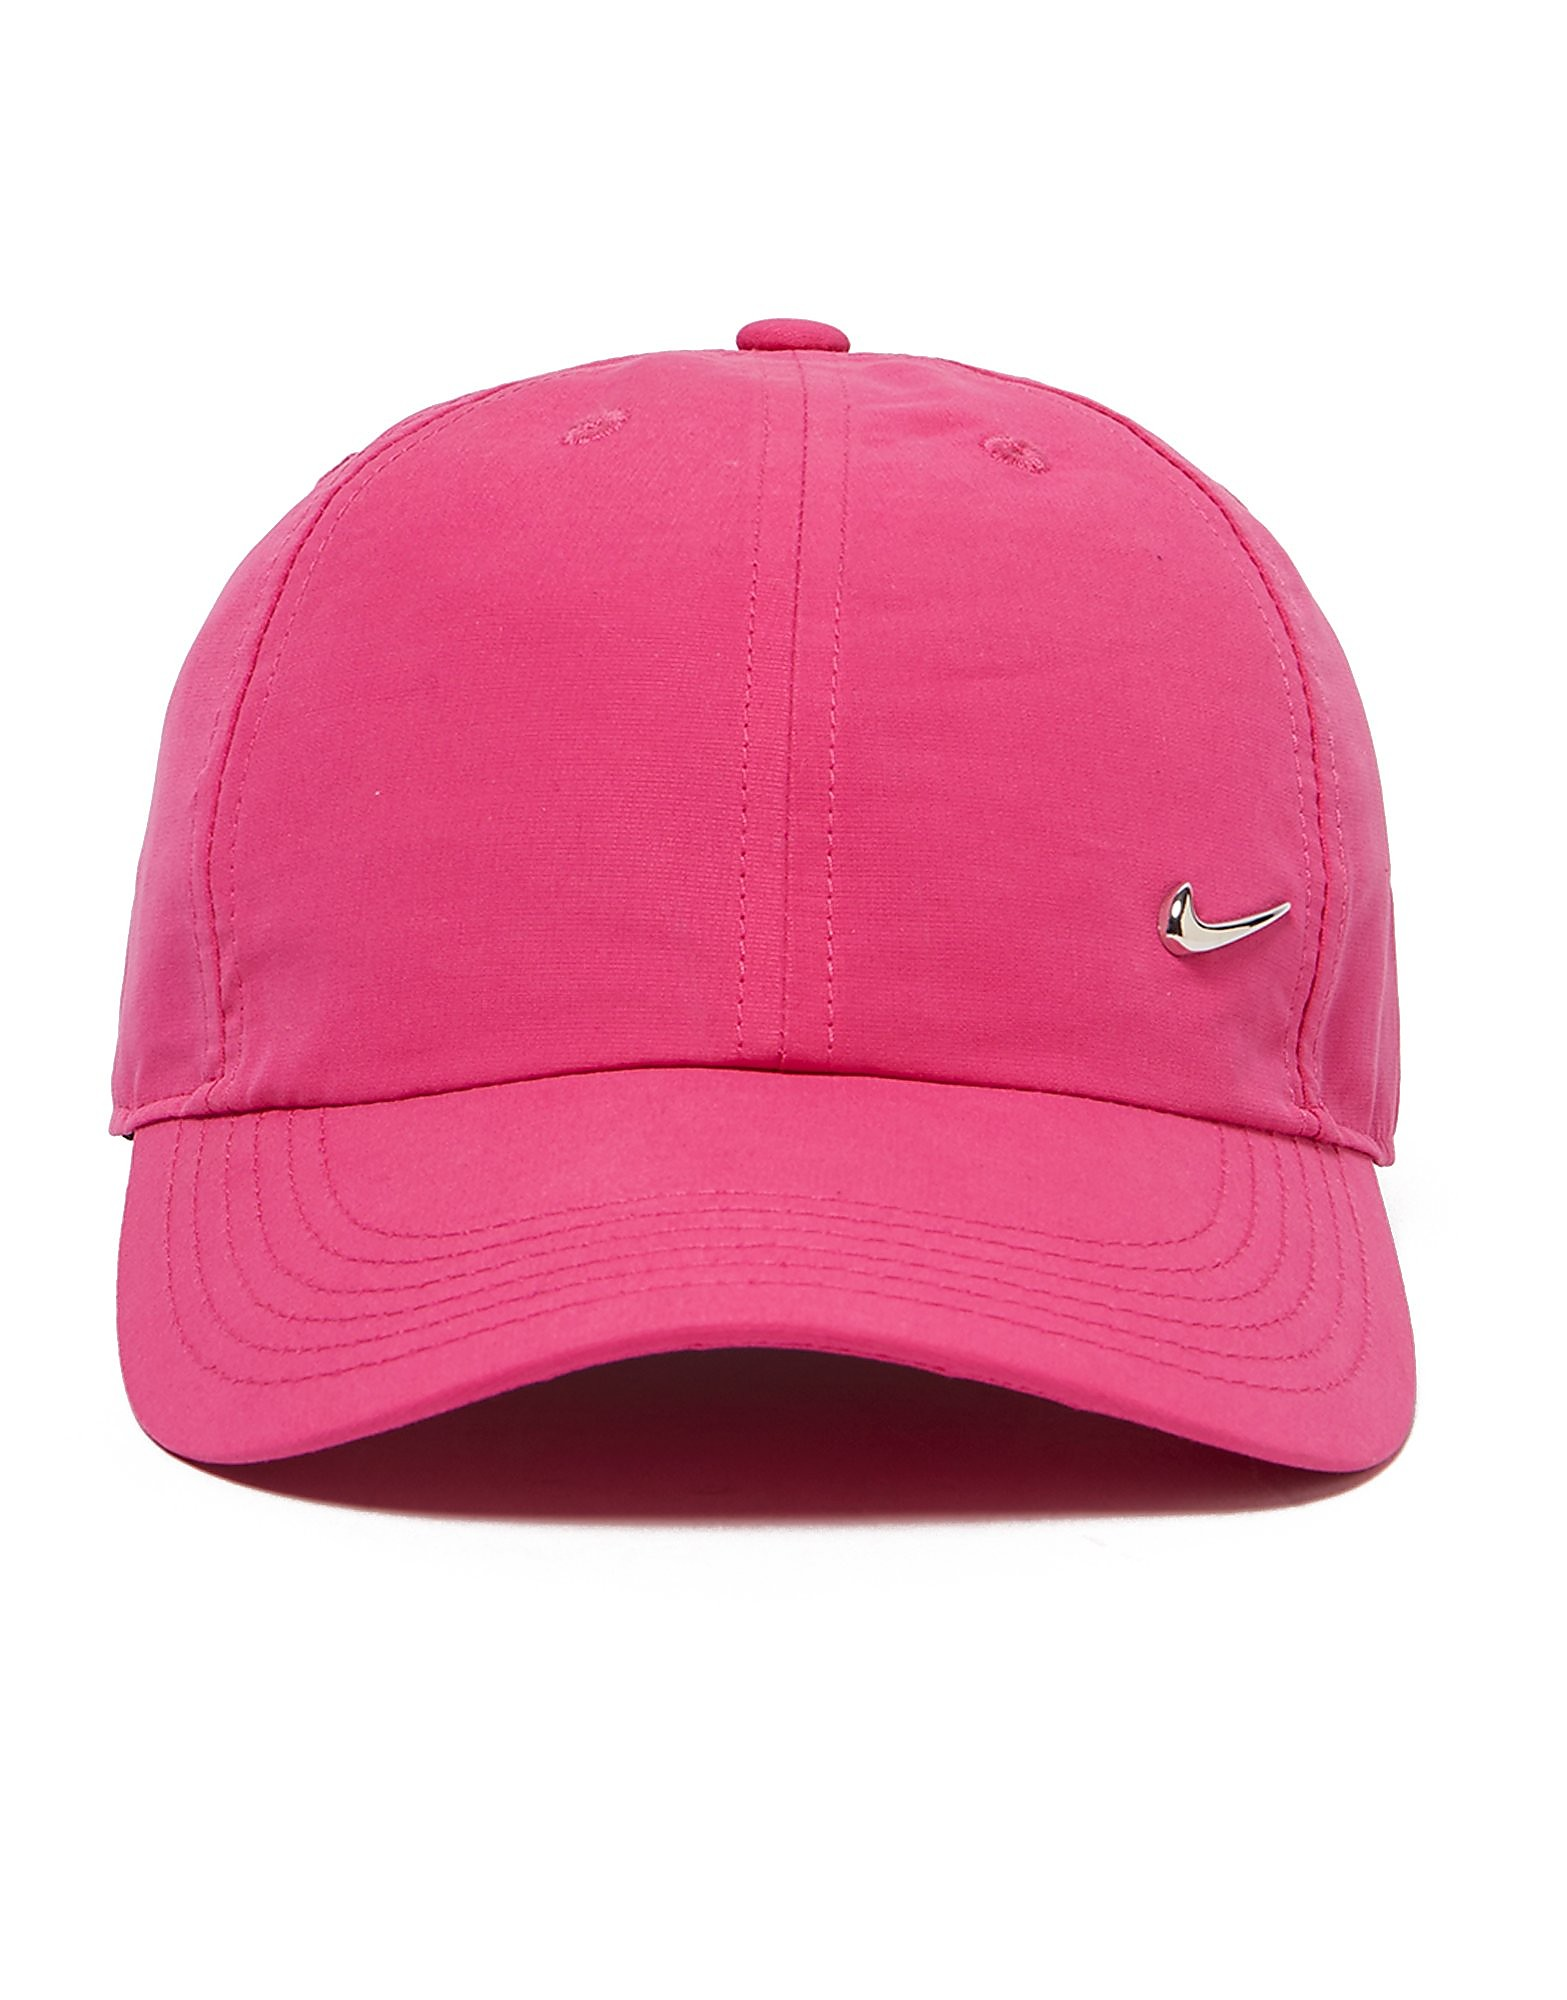 Nike Swoosh H86 Baseball Cap